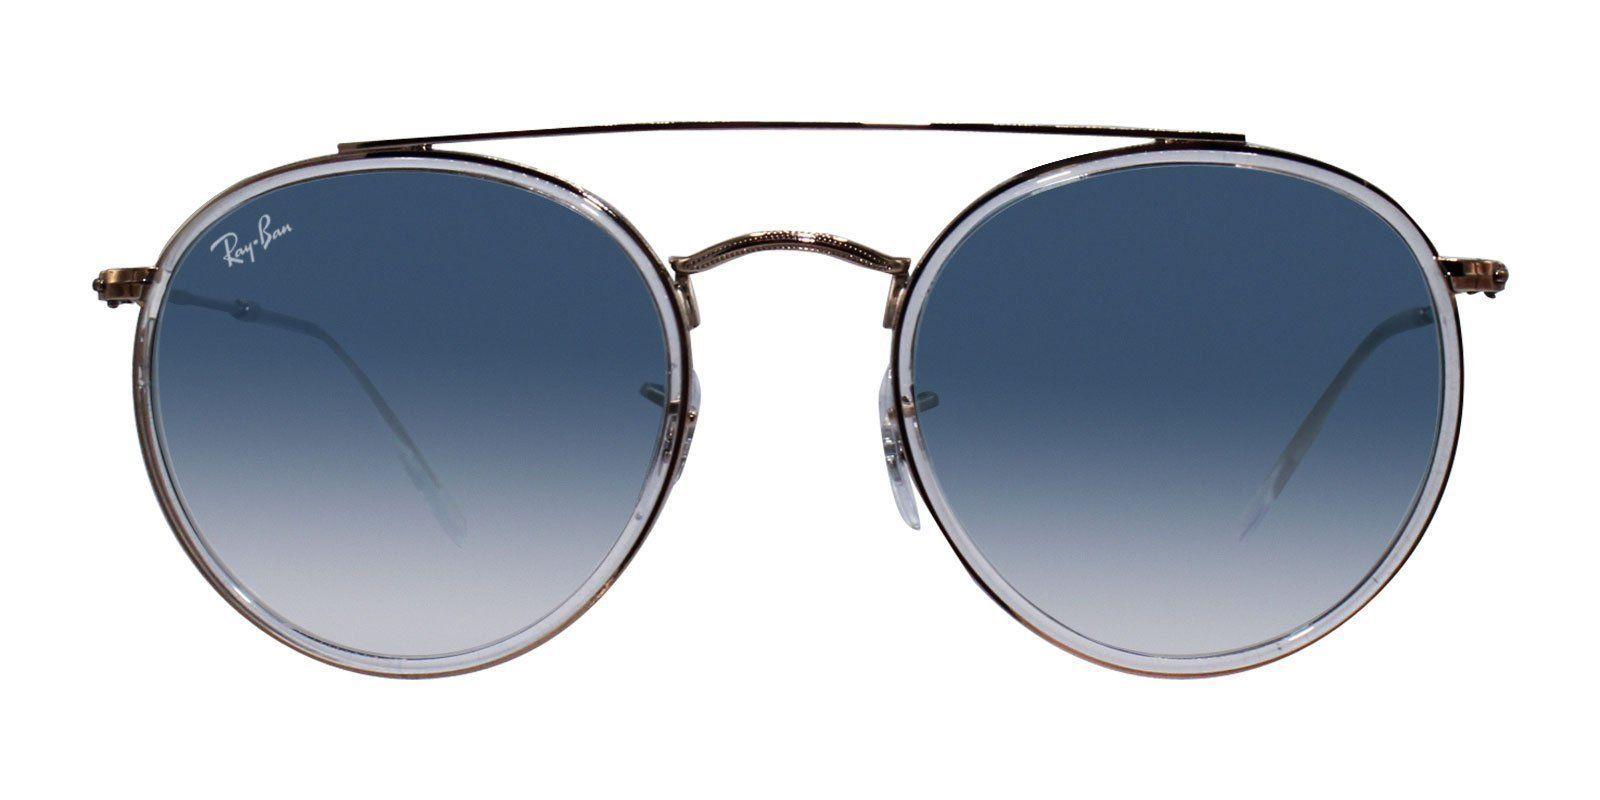 da77fe68ae Ray Ban - RB3647N Rose Gold - Blue sunglasses